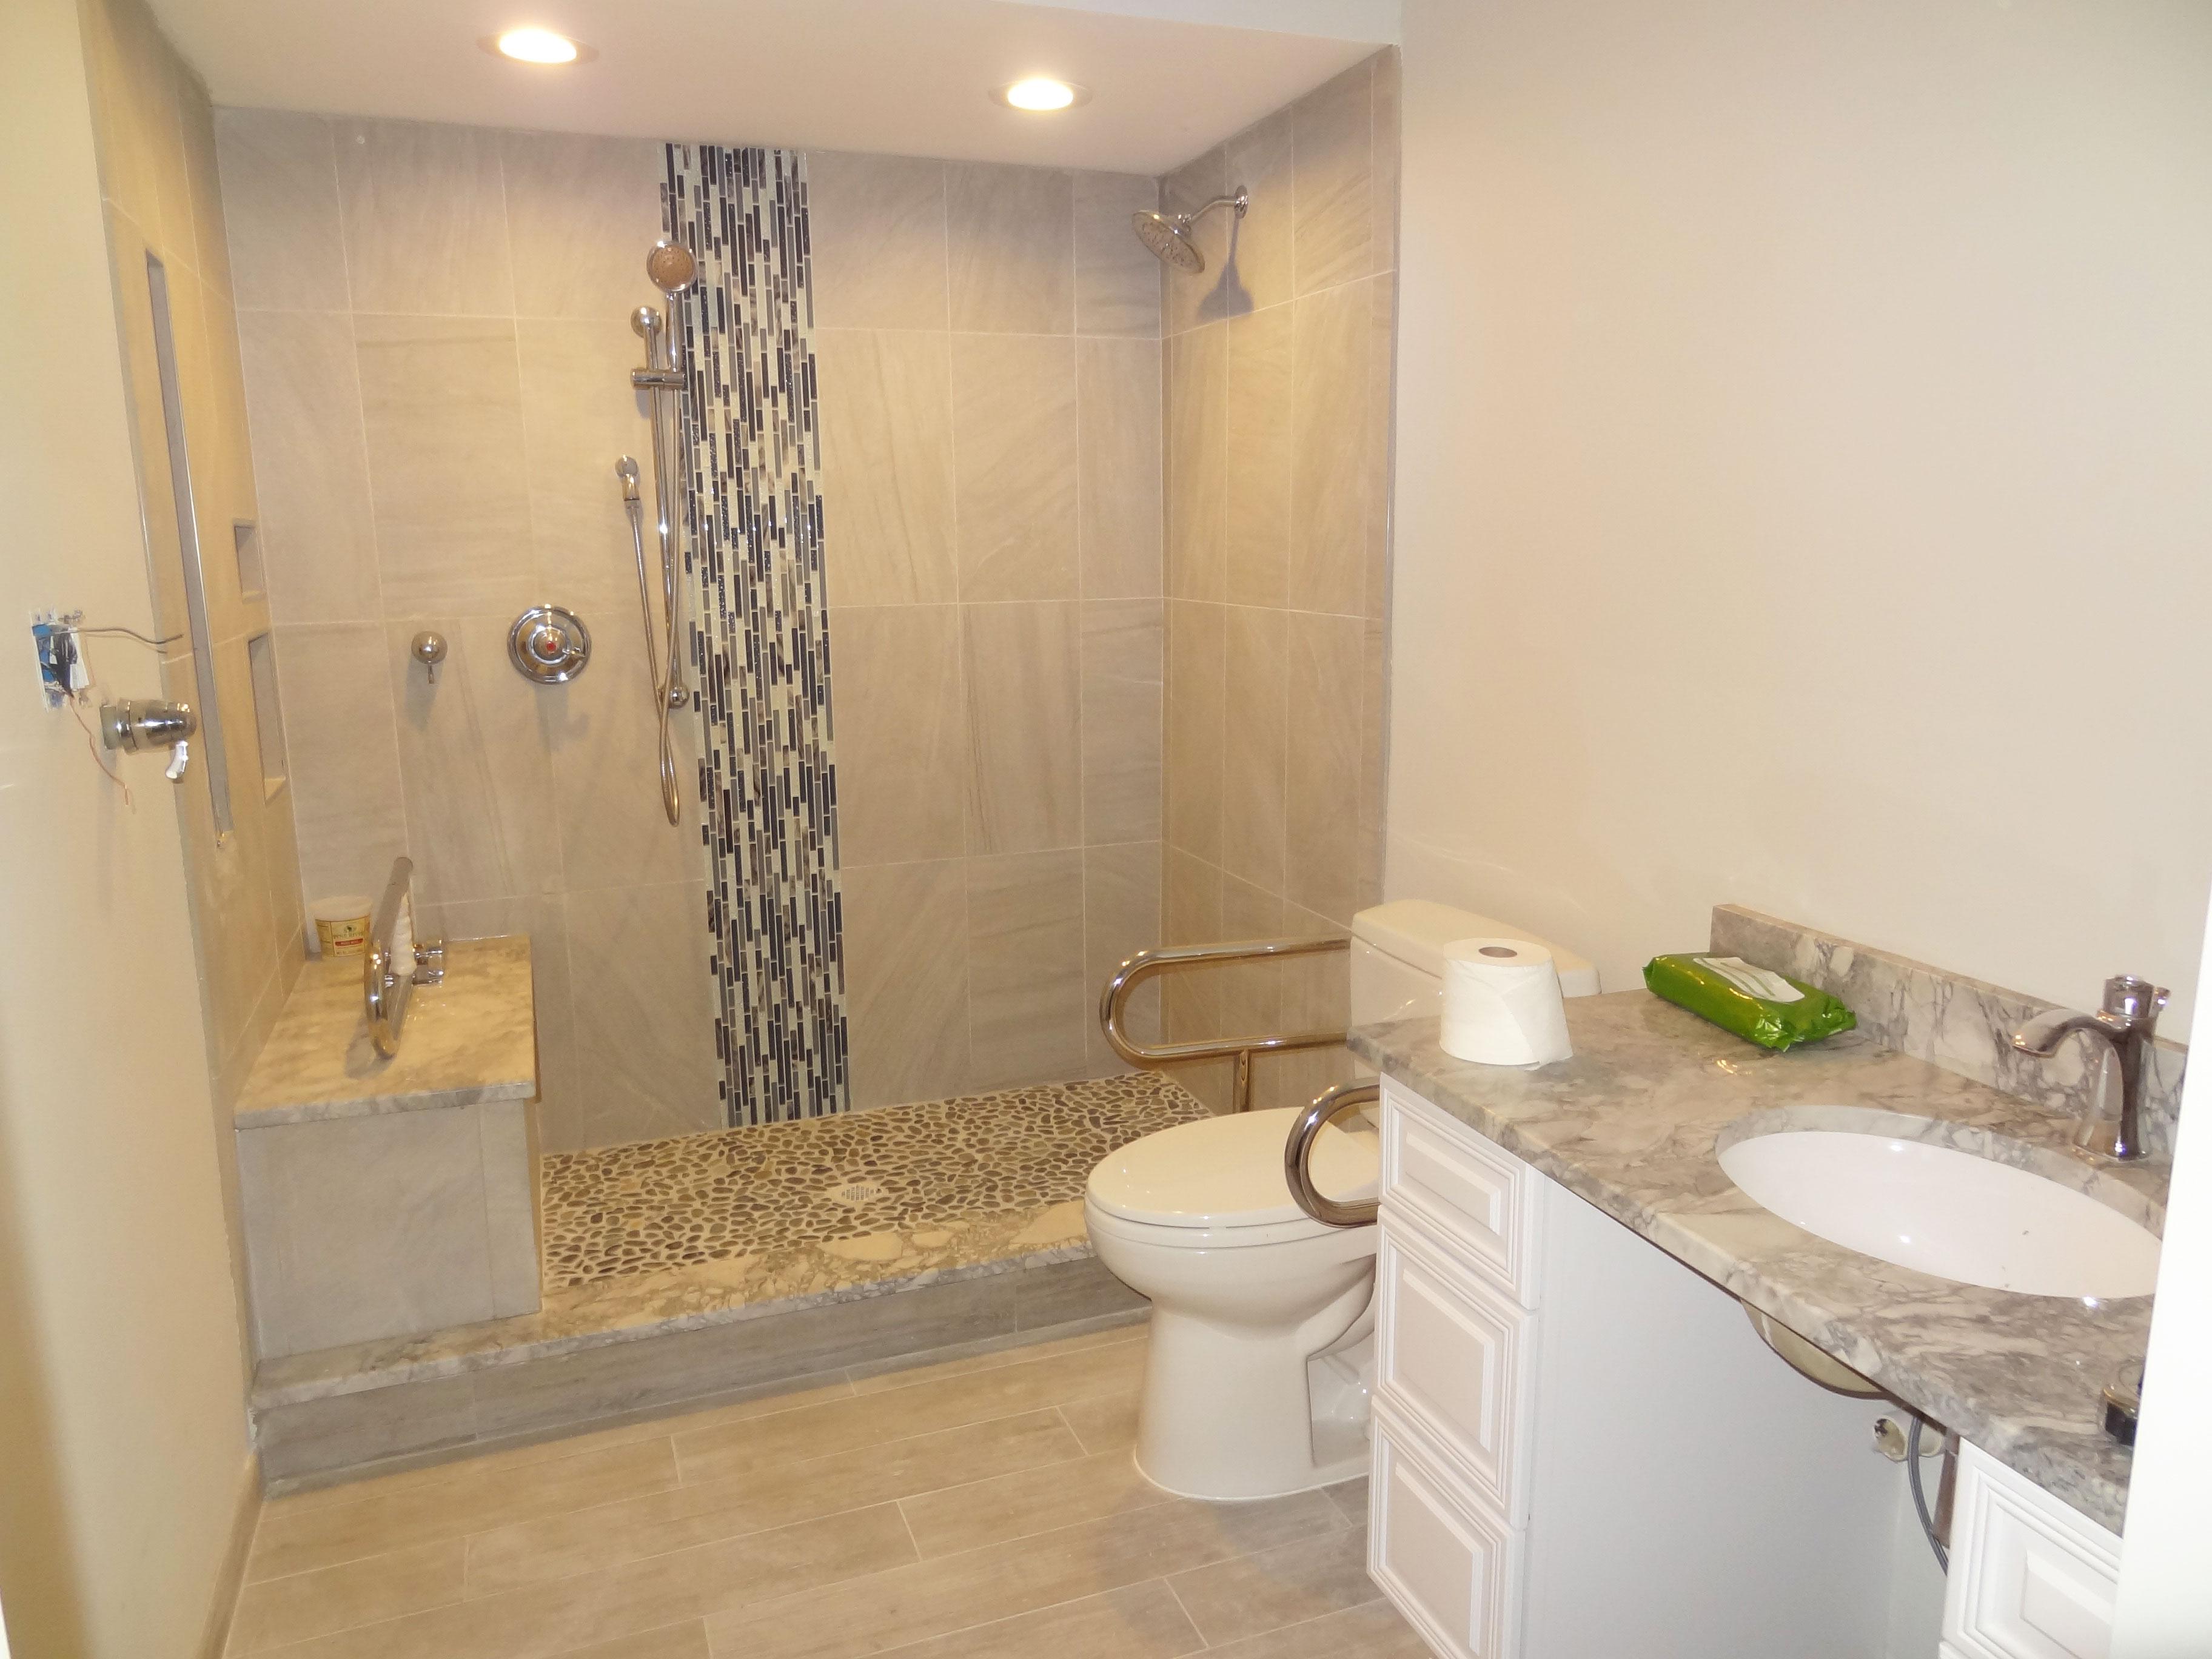 cool bathroom vanities nj model-Amazing Bathroom Vanities Nj Ideas